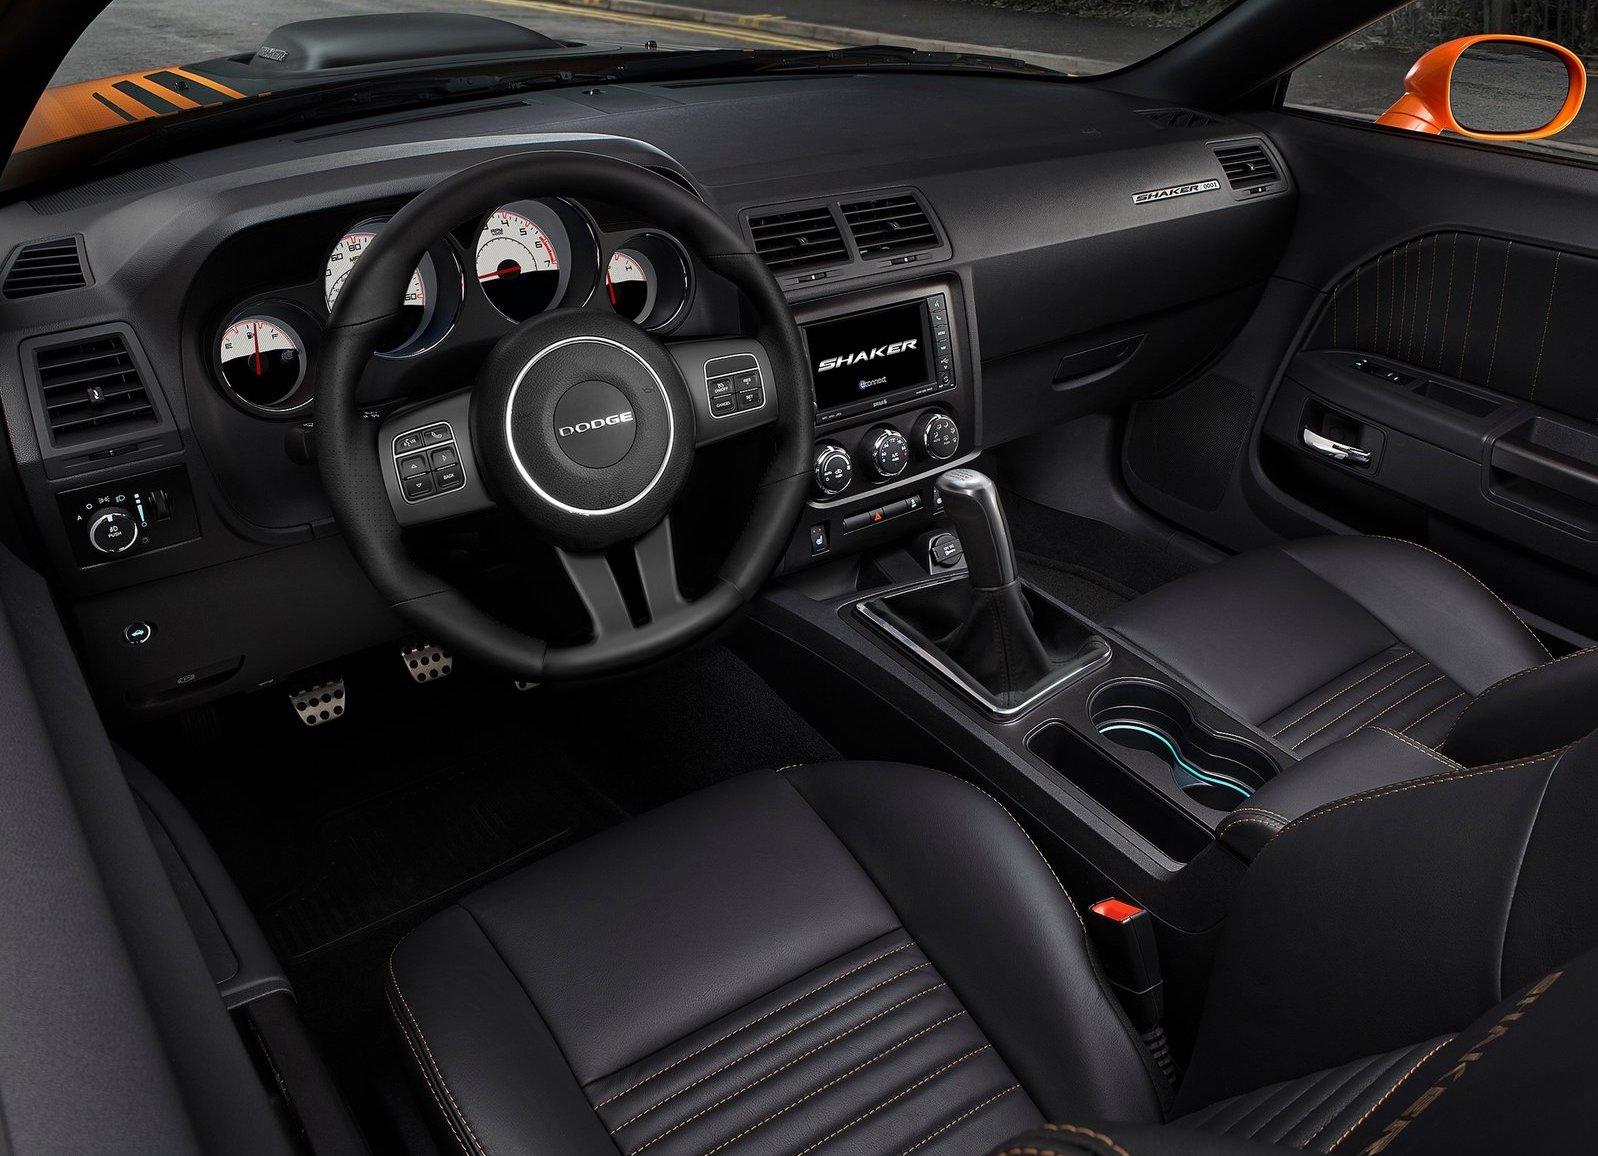 2014 Dodge Challenger R/T Shaker interior